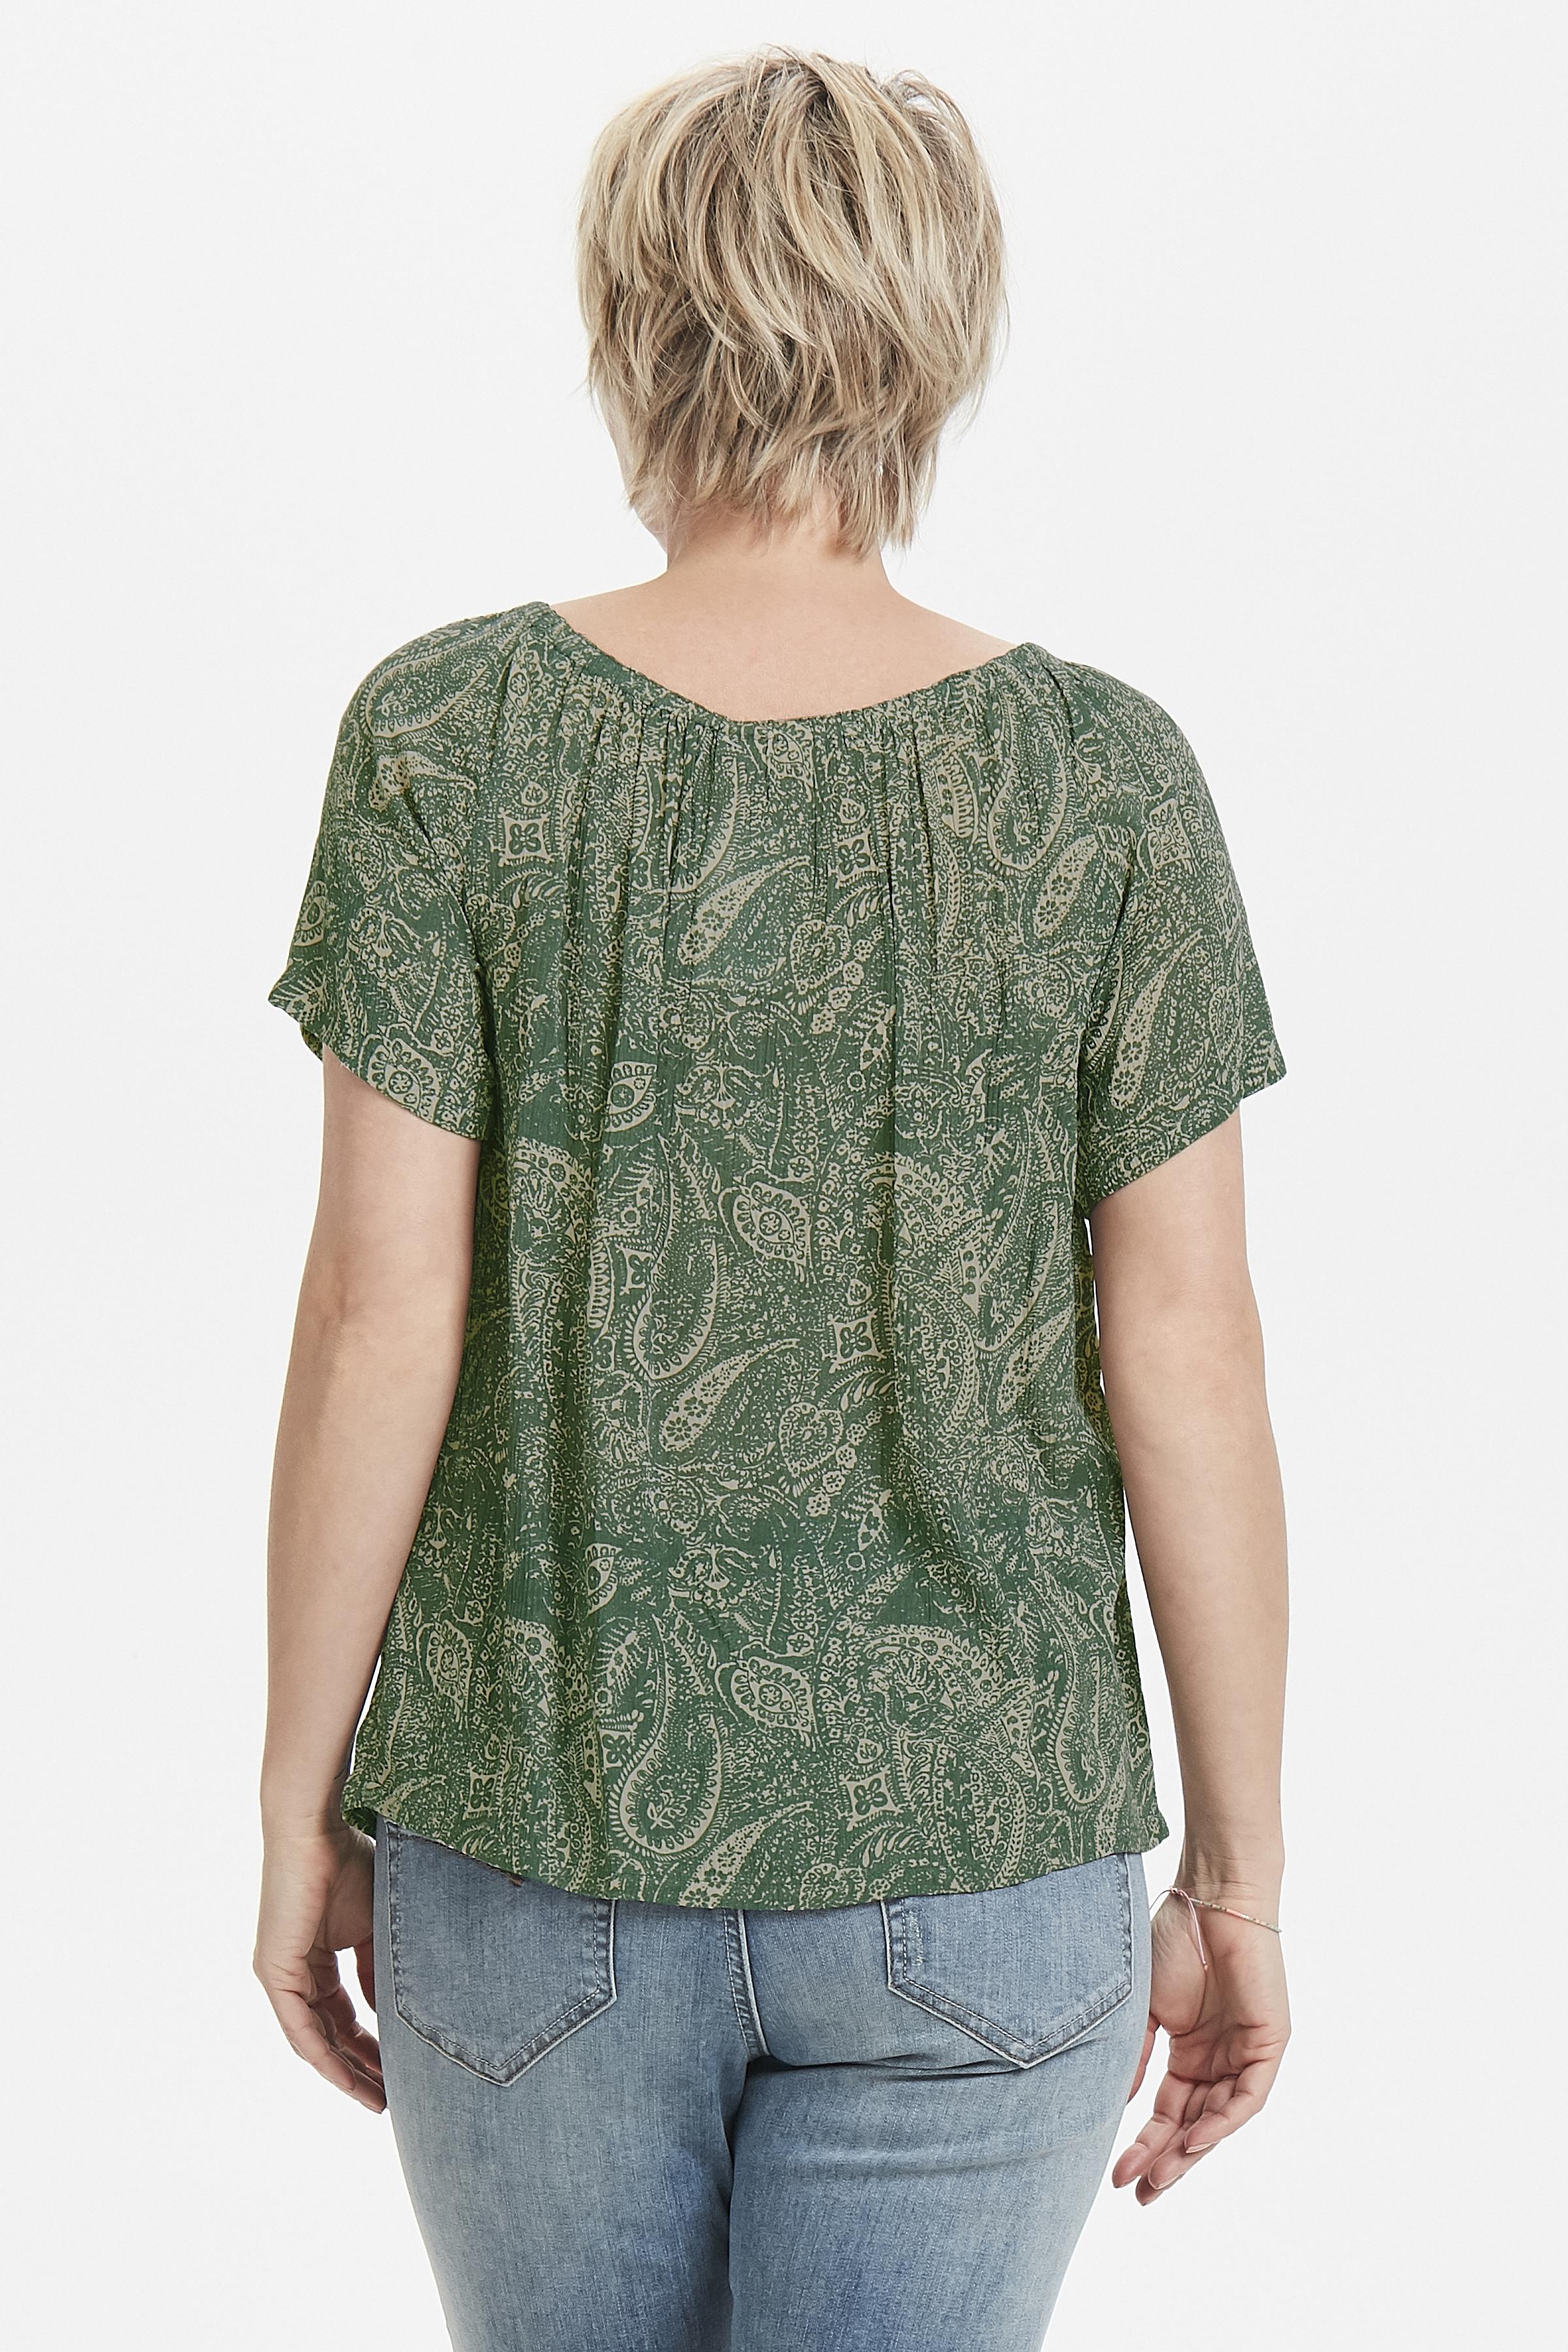 Grün/creme Bluse von Bon'A Parte – Shoppen SieGrün/creme Bluse ab Gr. S-2XL hier